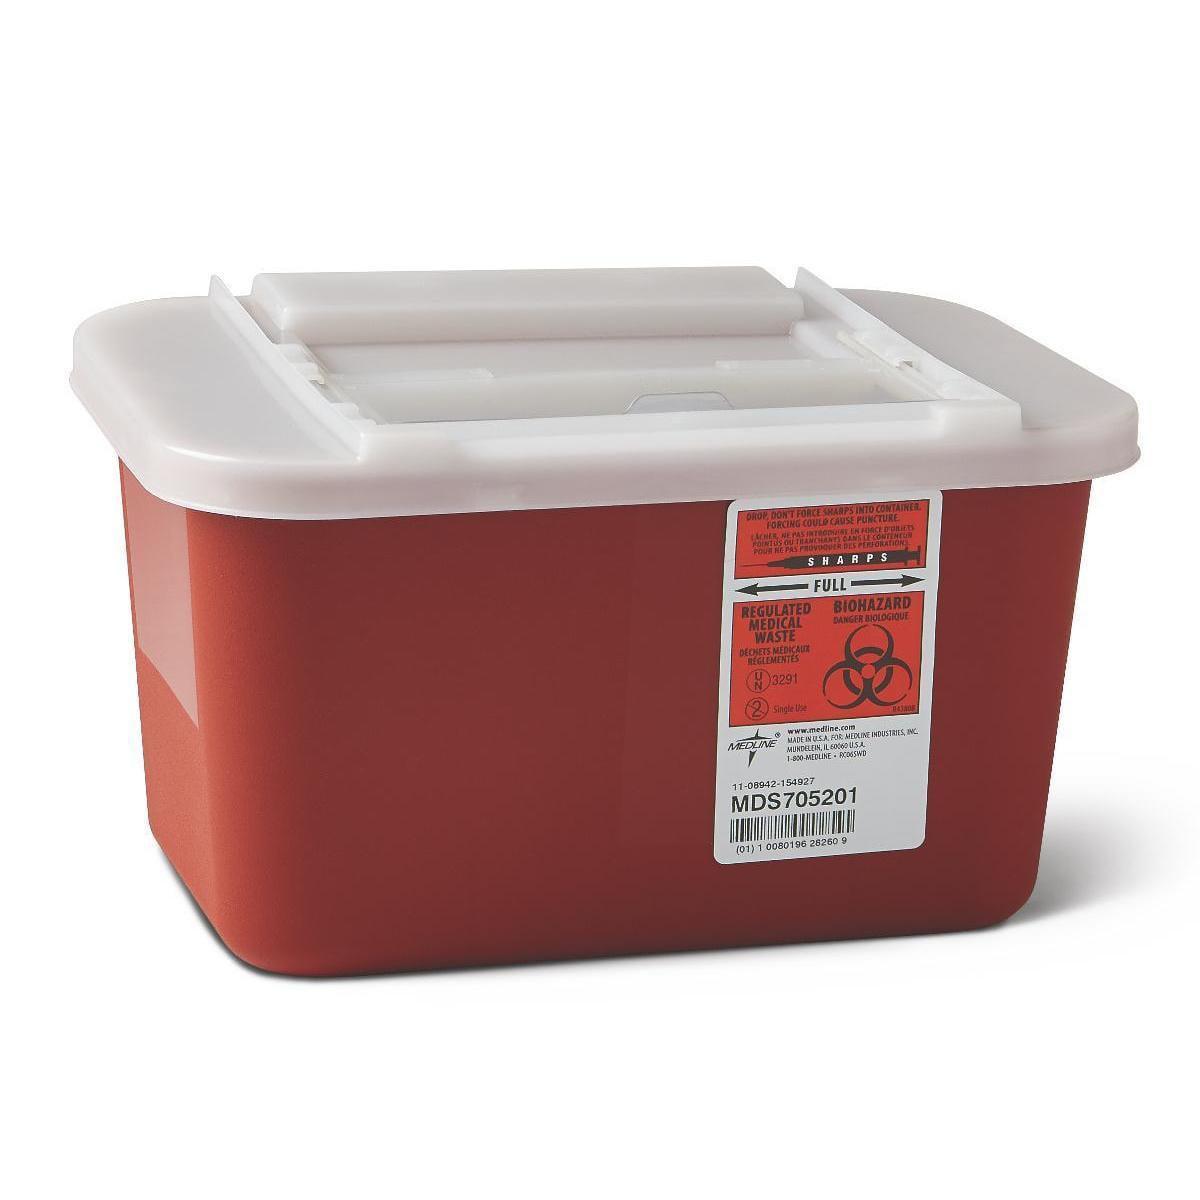 Medline  Biohazard Multi-Purpose Sharps Containers, 4 quarts (Pack of 32)